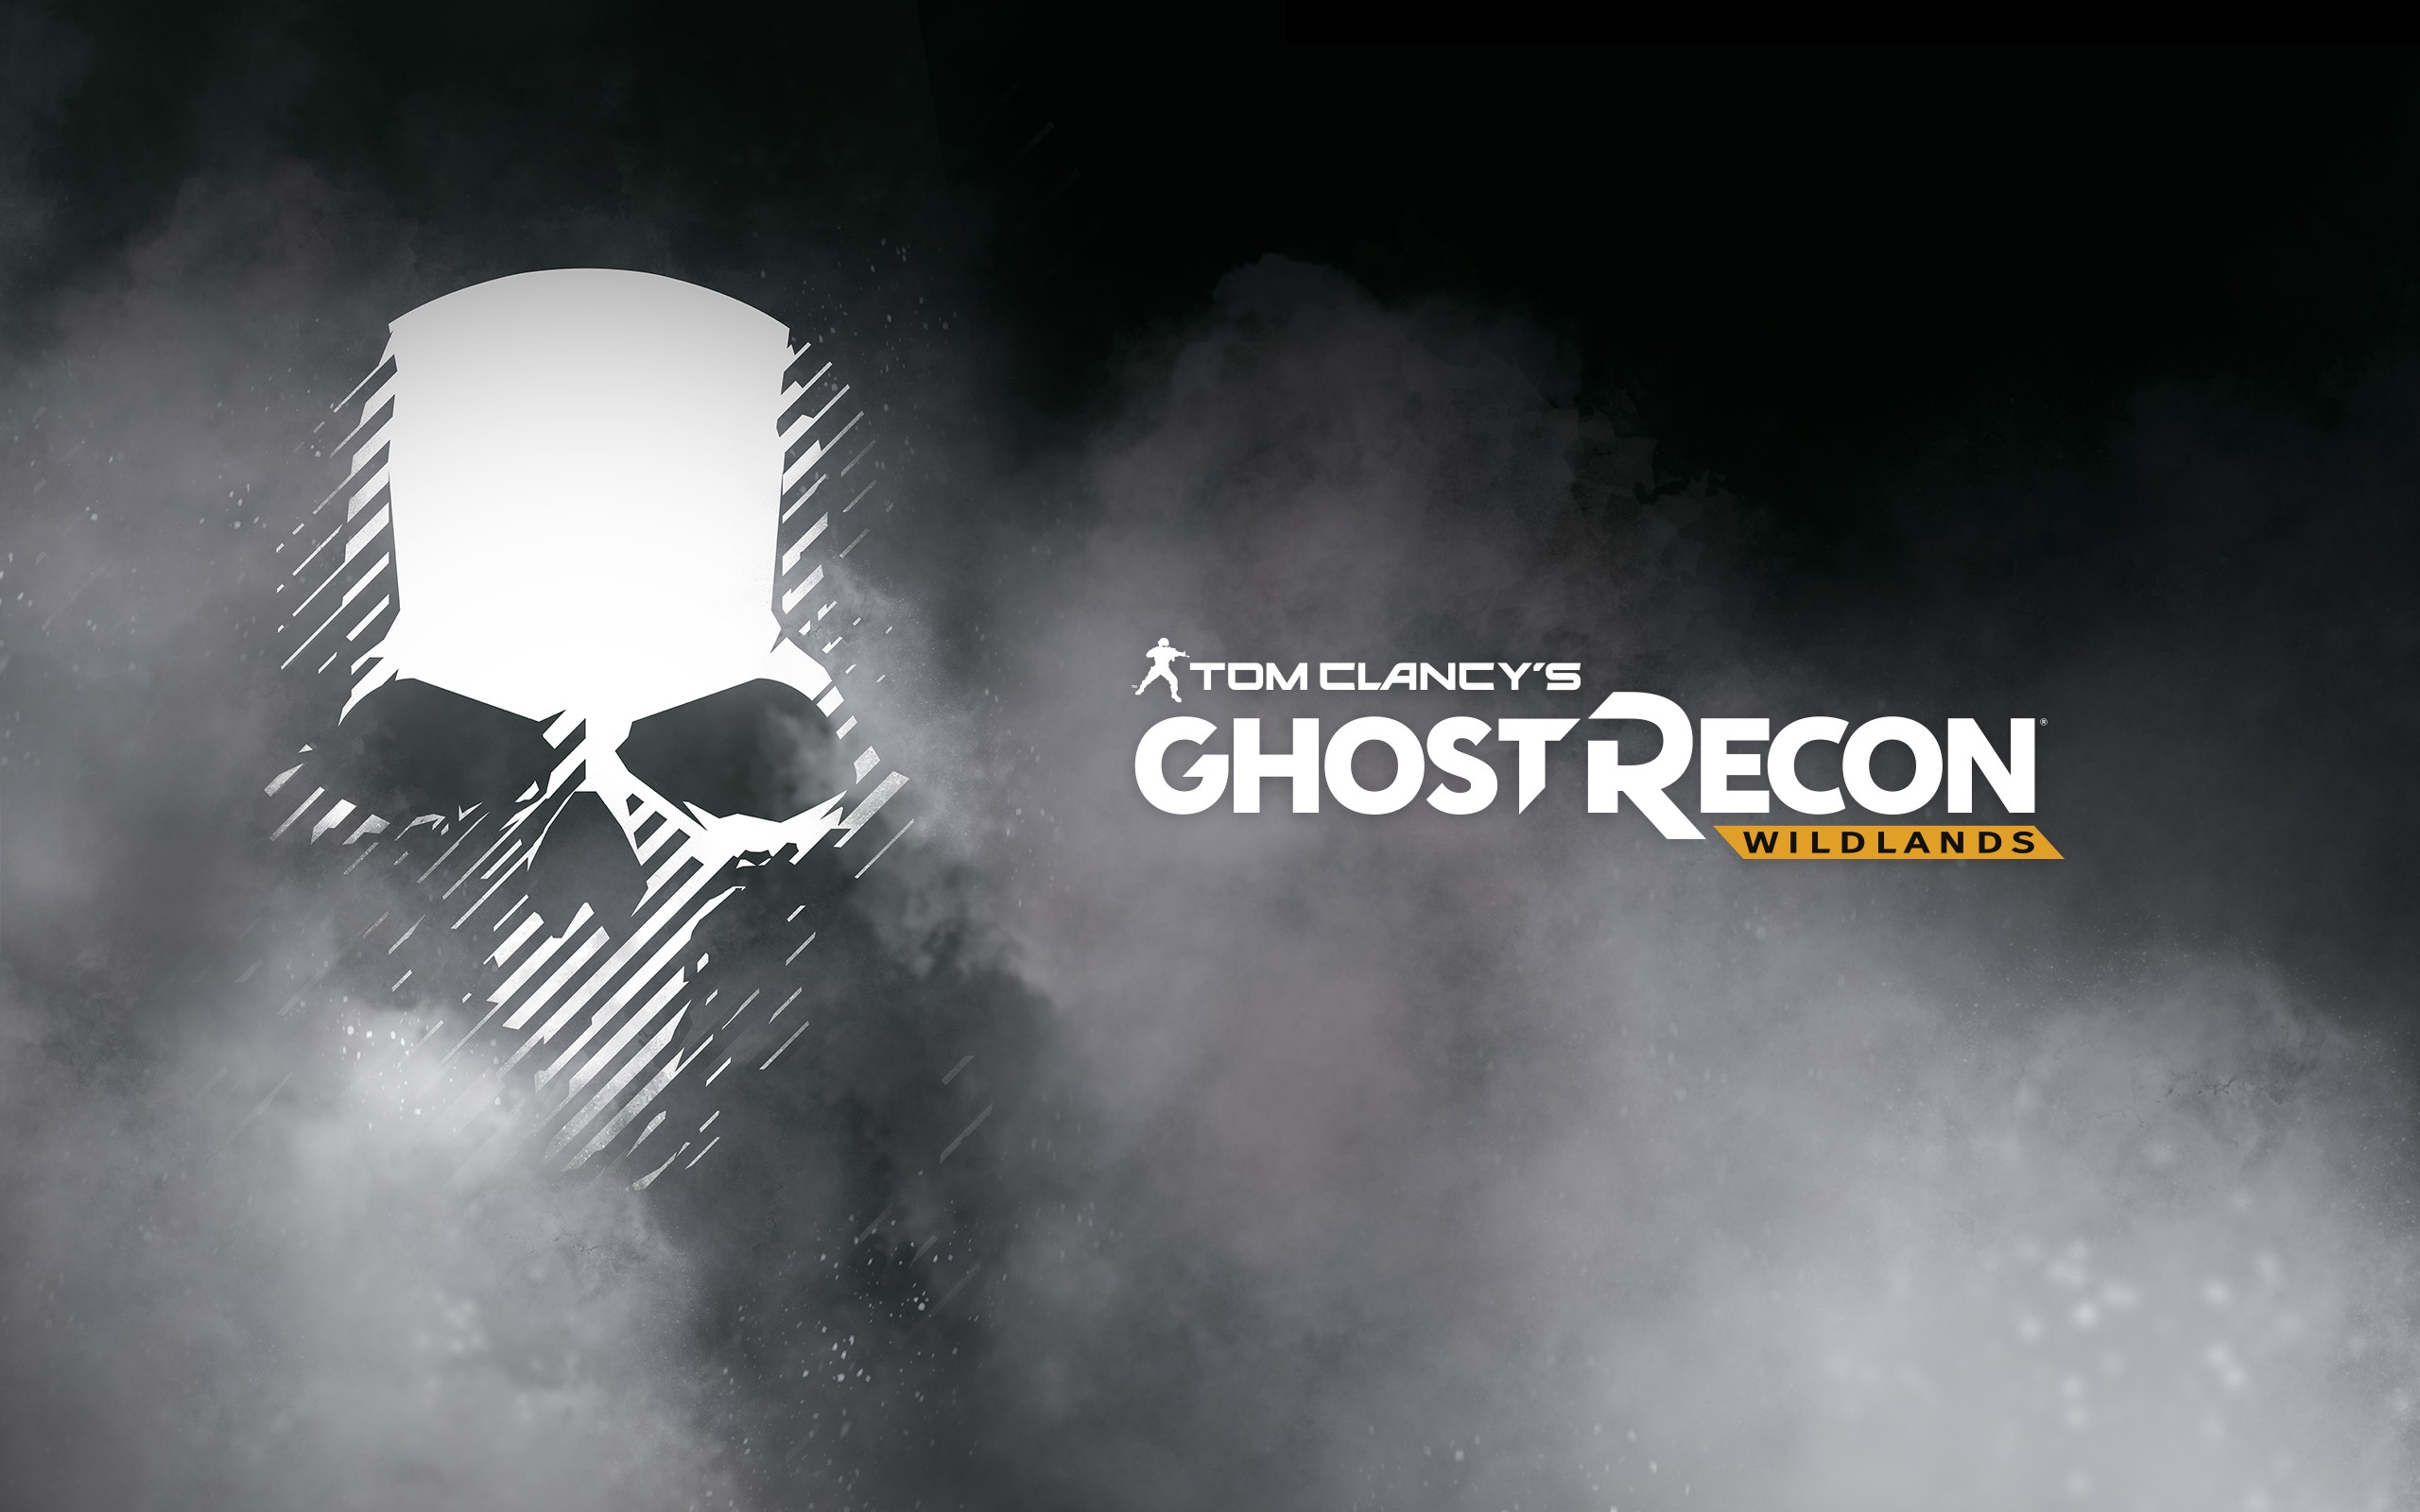 Ghost Recon Wildlands Wallpaper Download Free Stunning High